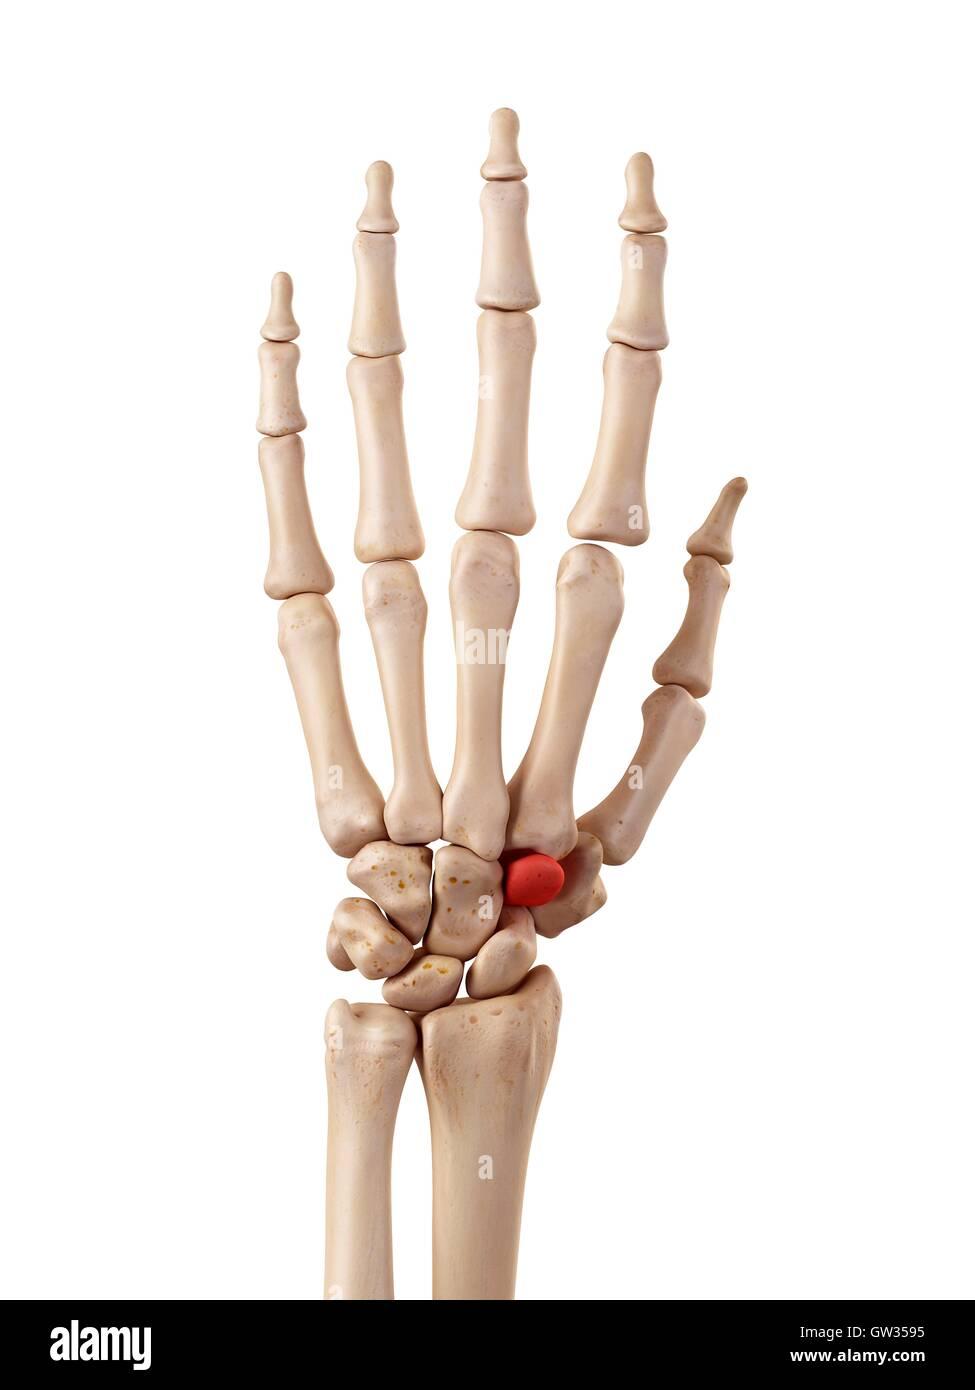 Human Fingers Anatomy Stock Photos & Human Fingers Anatomy Stock ...